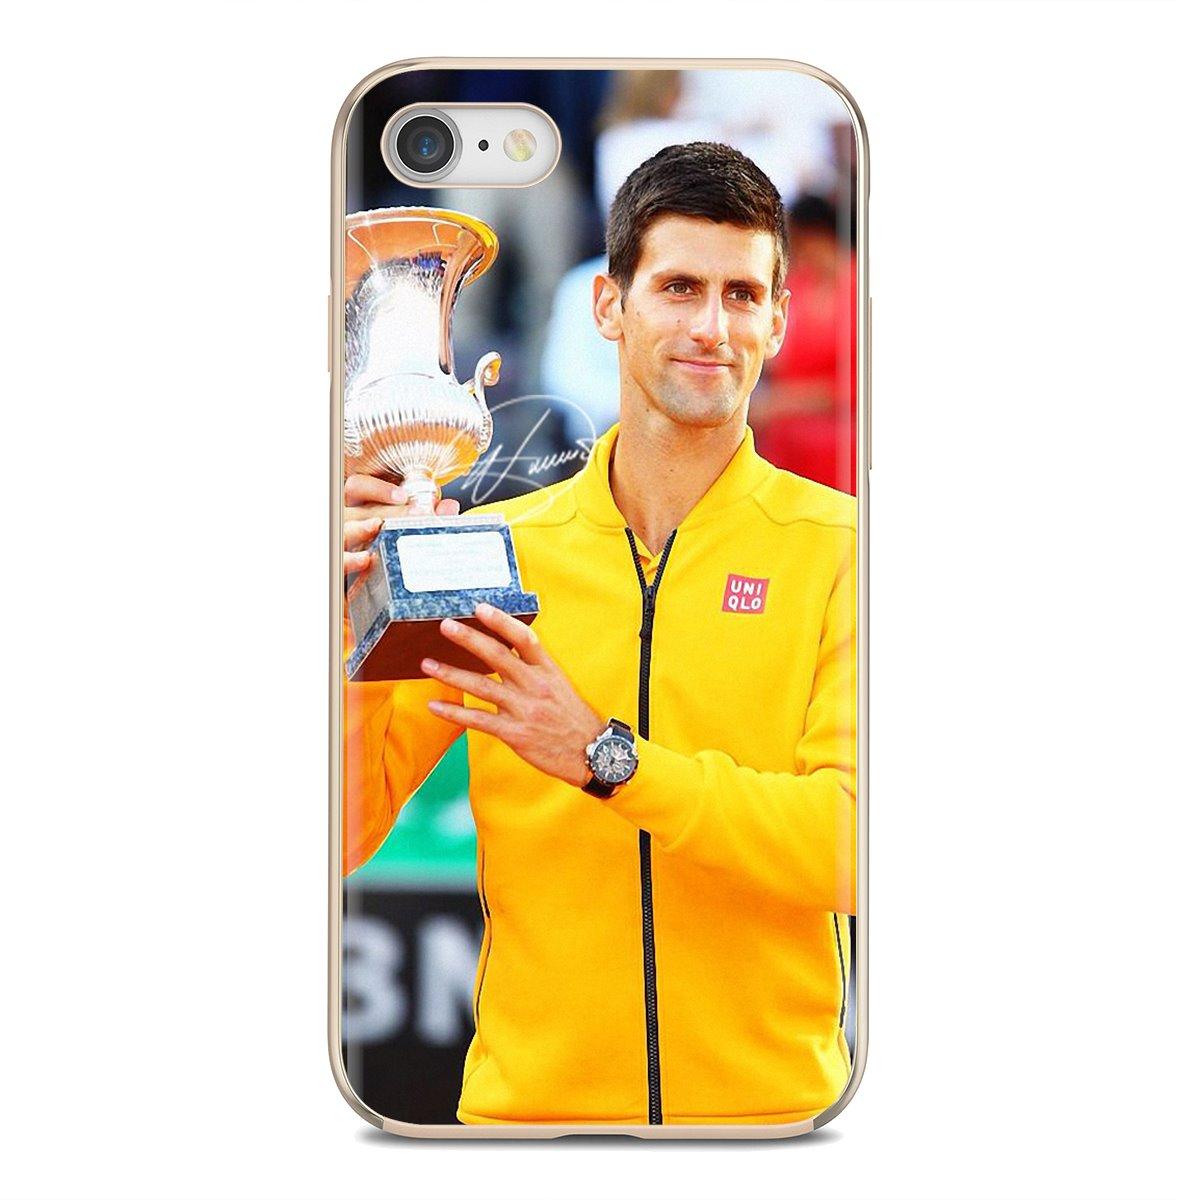 Novak Djokovic jugador de tenis para Xiaomi Mi A1 A2 A3 5X 6X 8 9 9t Lite SE Pro Mi Max Mix tableta amortiguador Tech accesorio beige Rojo Negro compruebe Tartan tableta amortiguador 2S funda de carcasa blanda